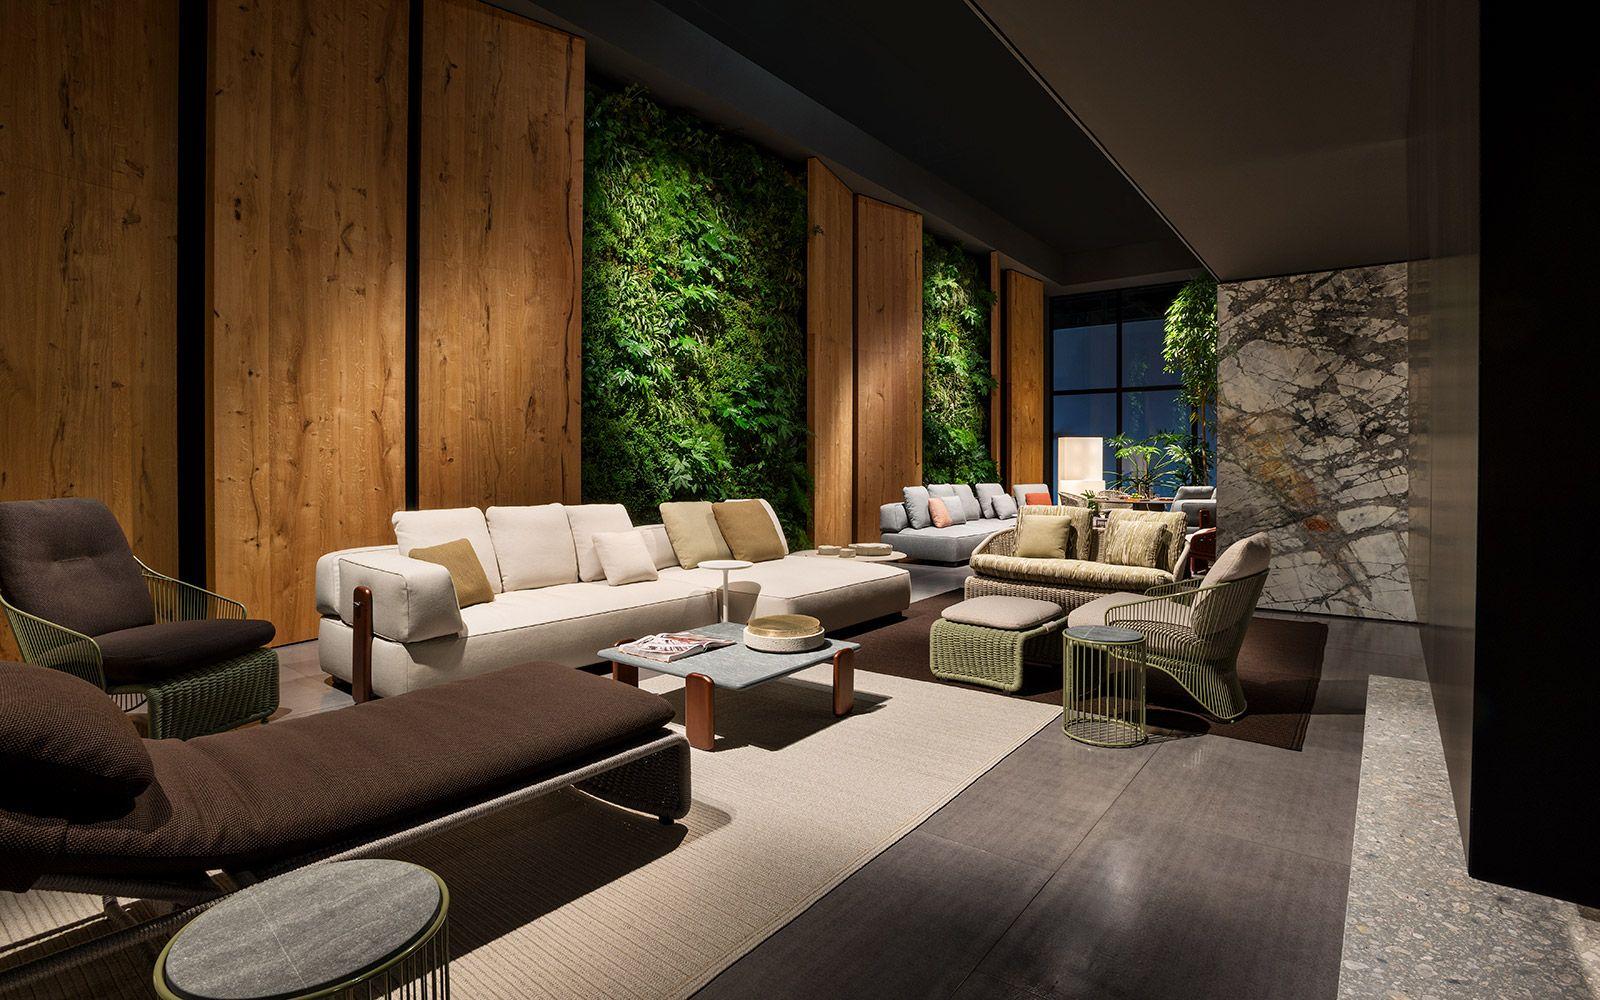 Florida Rodolfo Dordoni Design Colette Outdoor Interior ArchitectureInterior